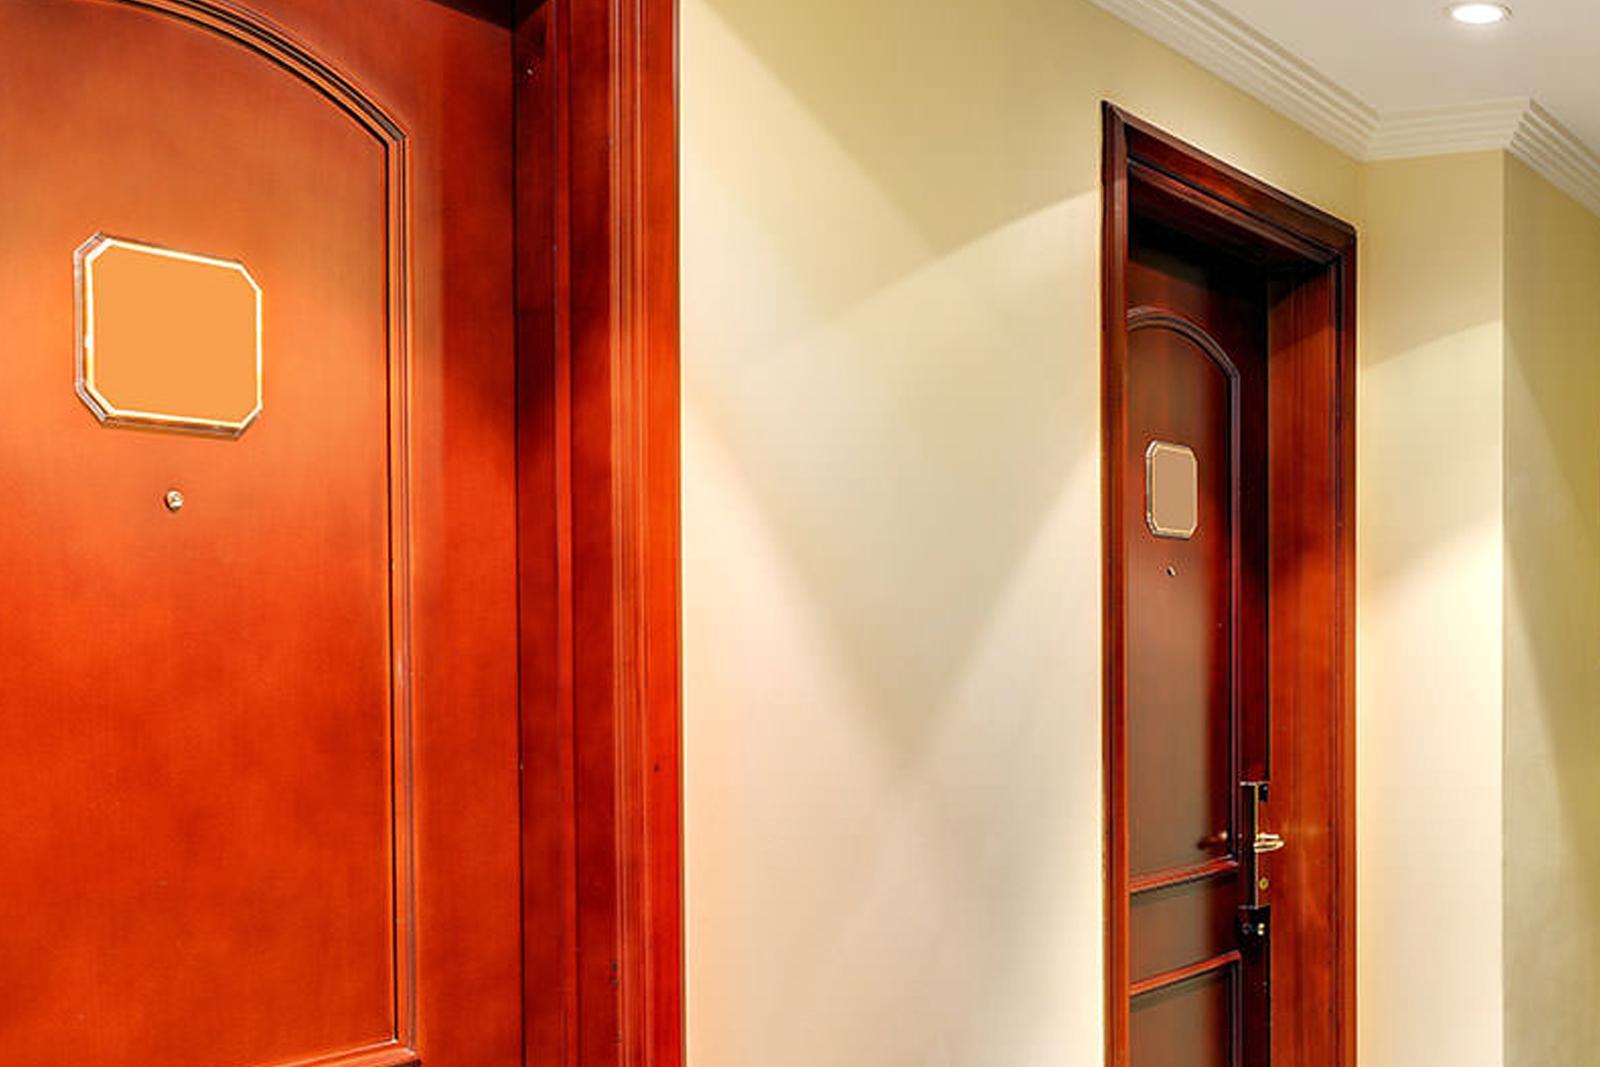 Wood fire-rated door frames in a hallway